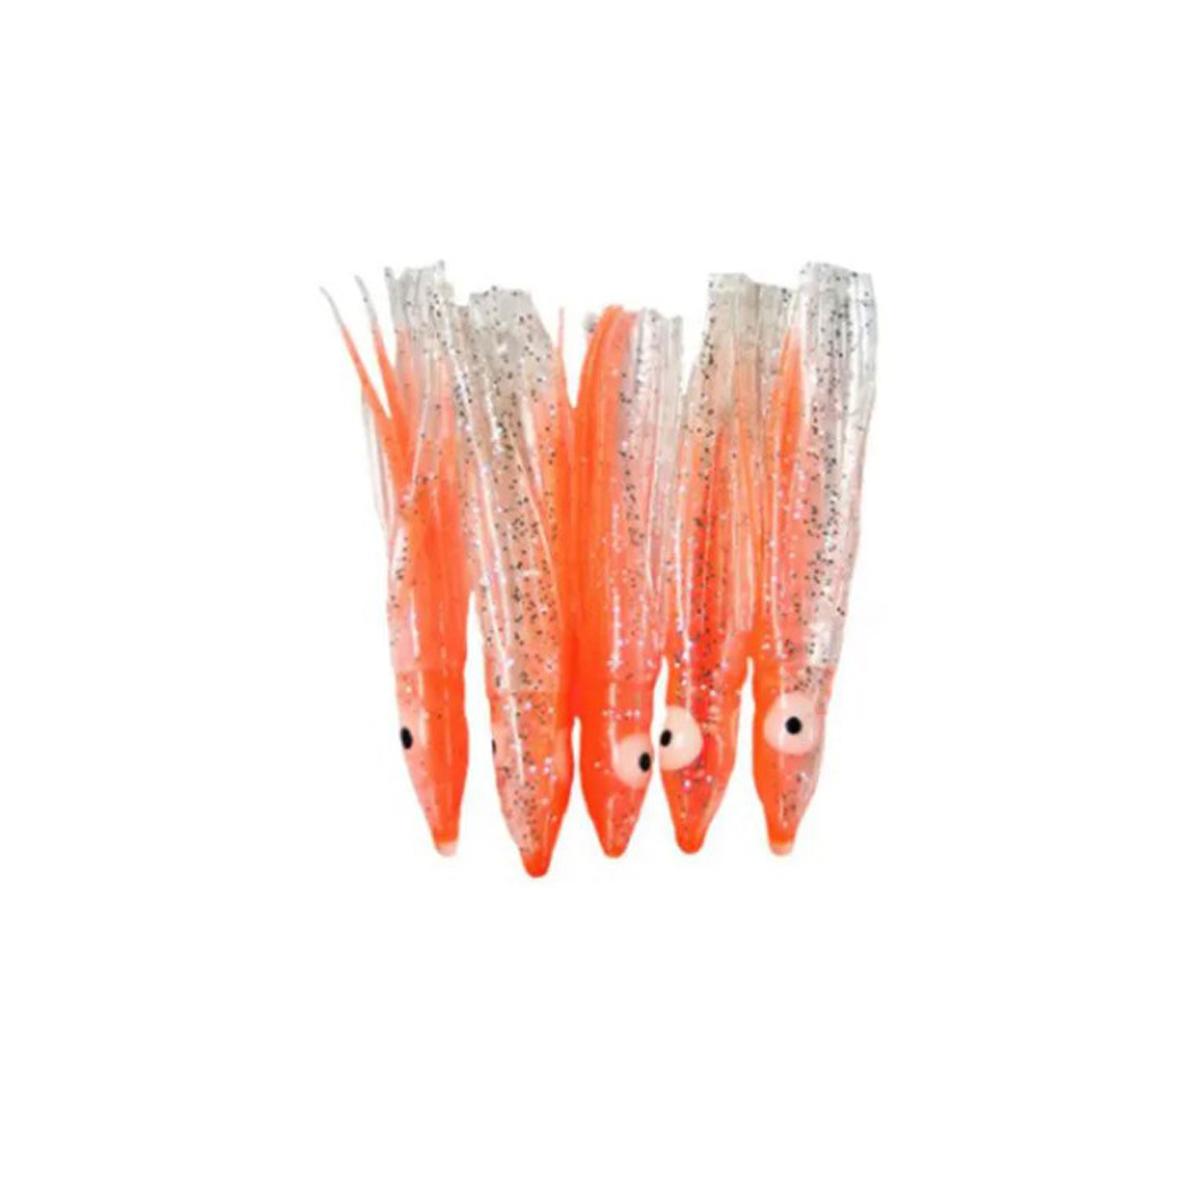 Kit 25 Lulinhas Kalmar 6,3 cm (Cores Variadas)  - Pró Pesca Shop